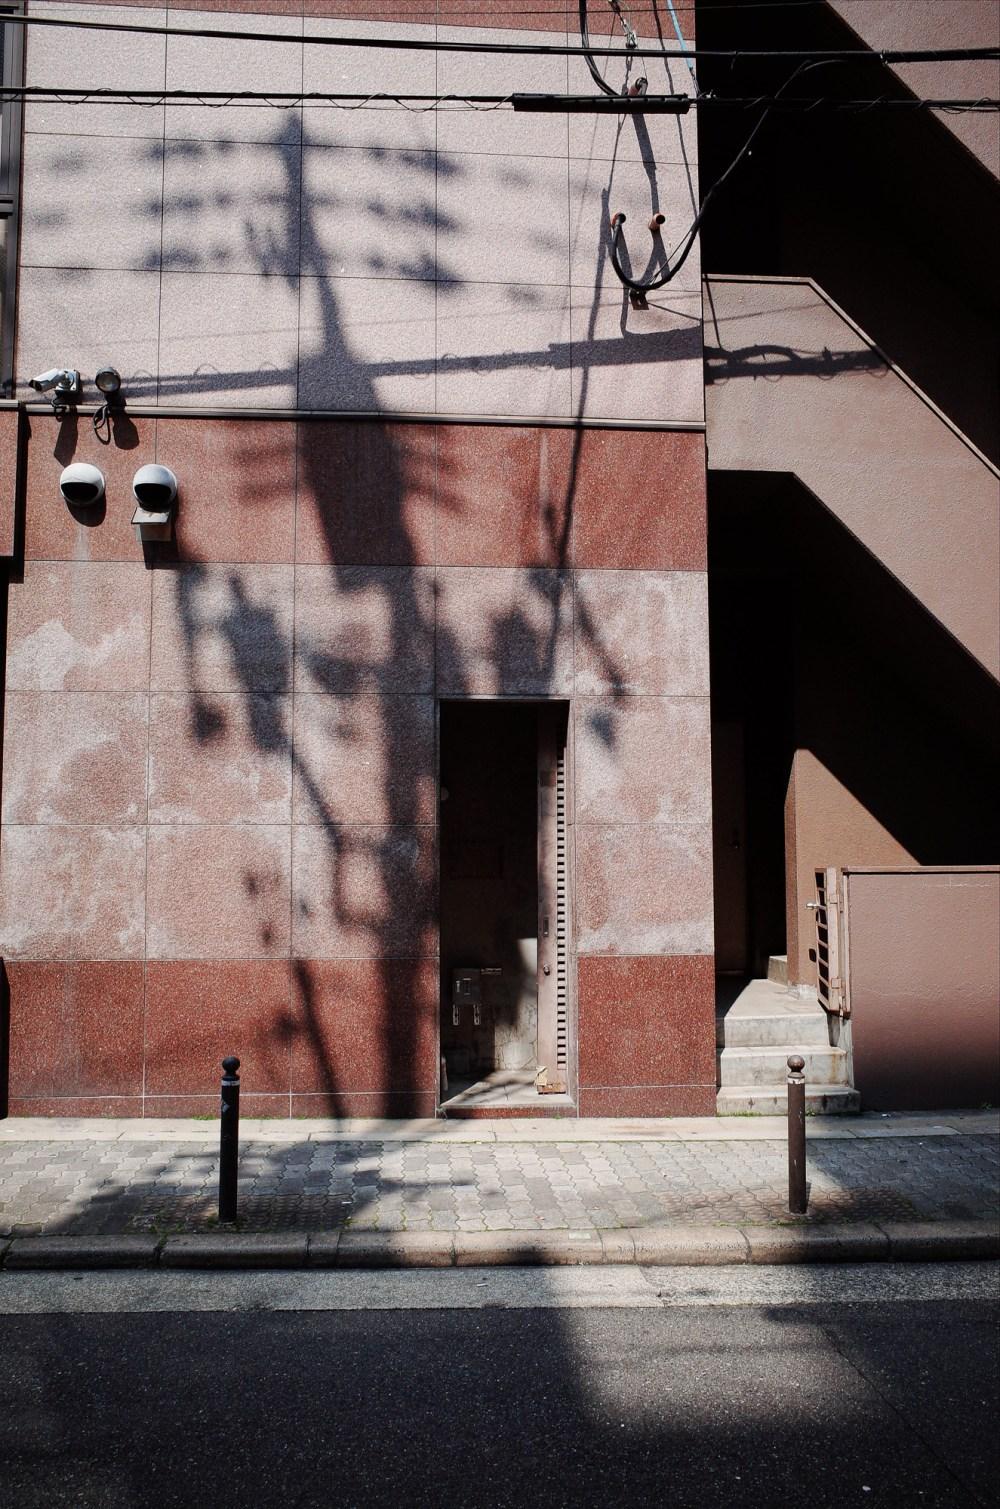 Urban landscape and shadows. Osaka, 2018